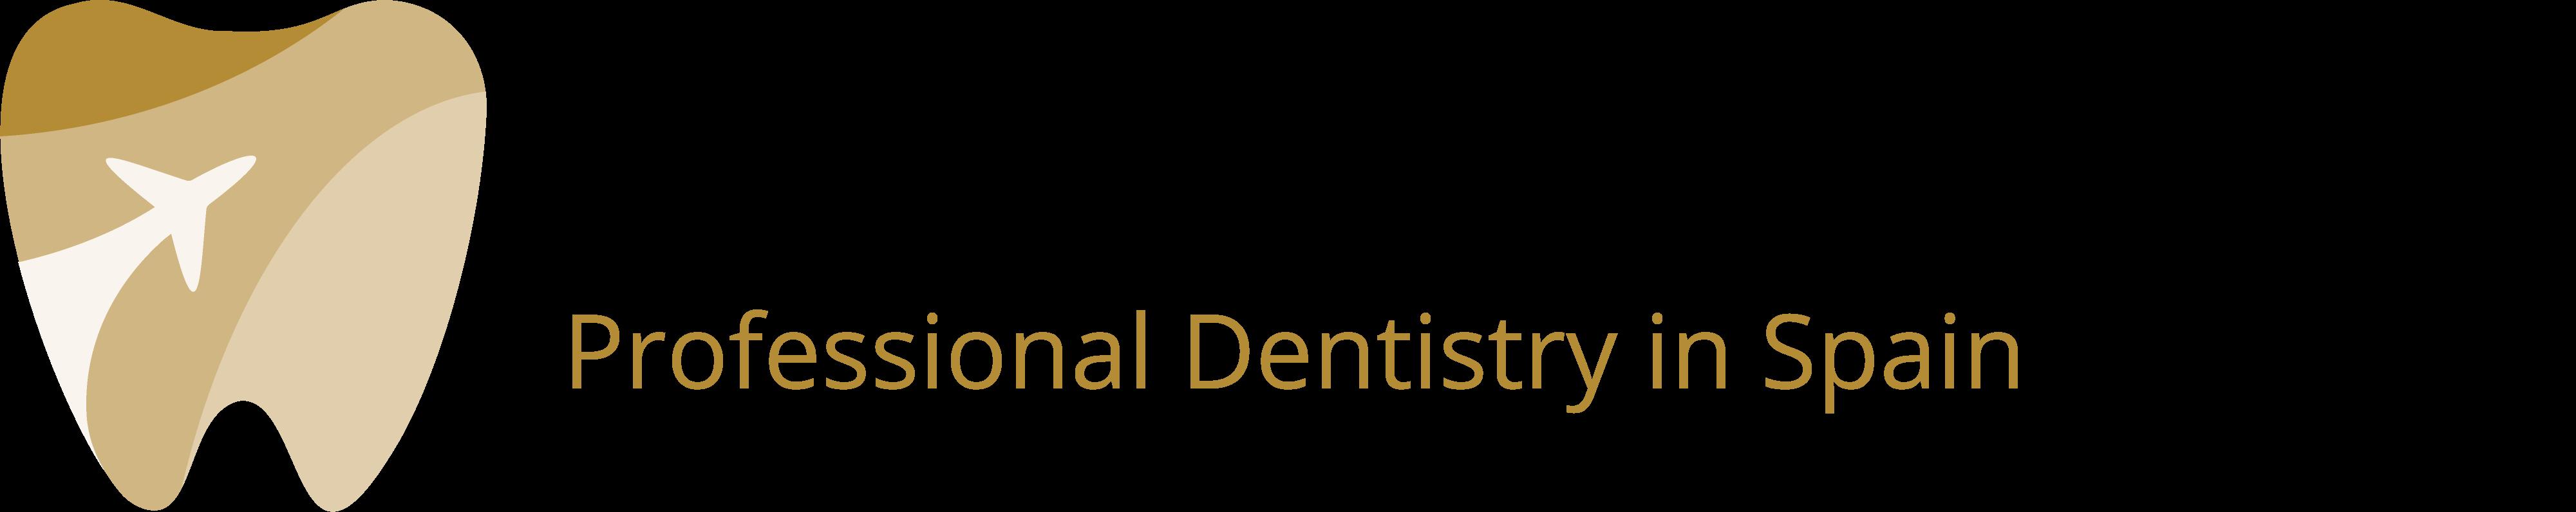 Dental Treatment In Spain